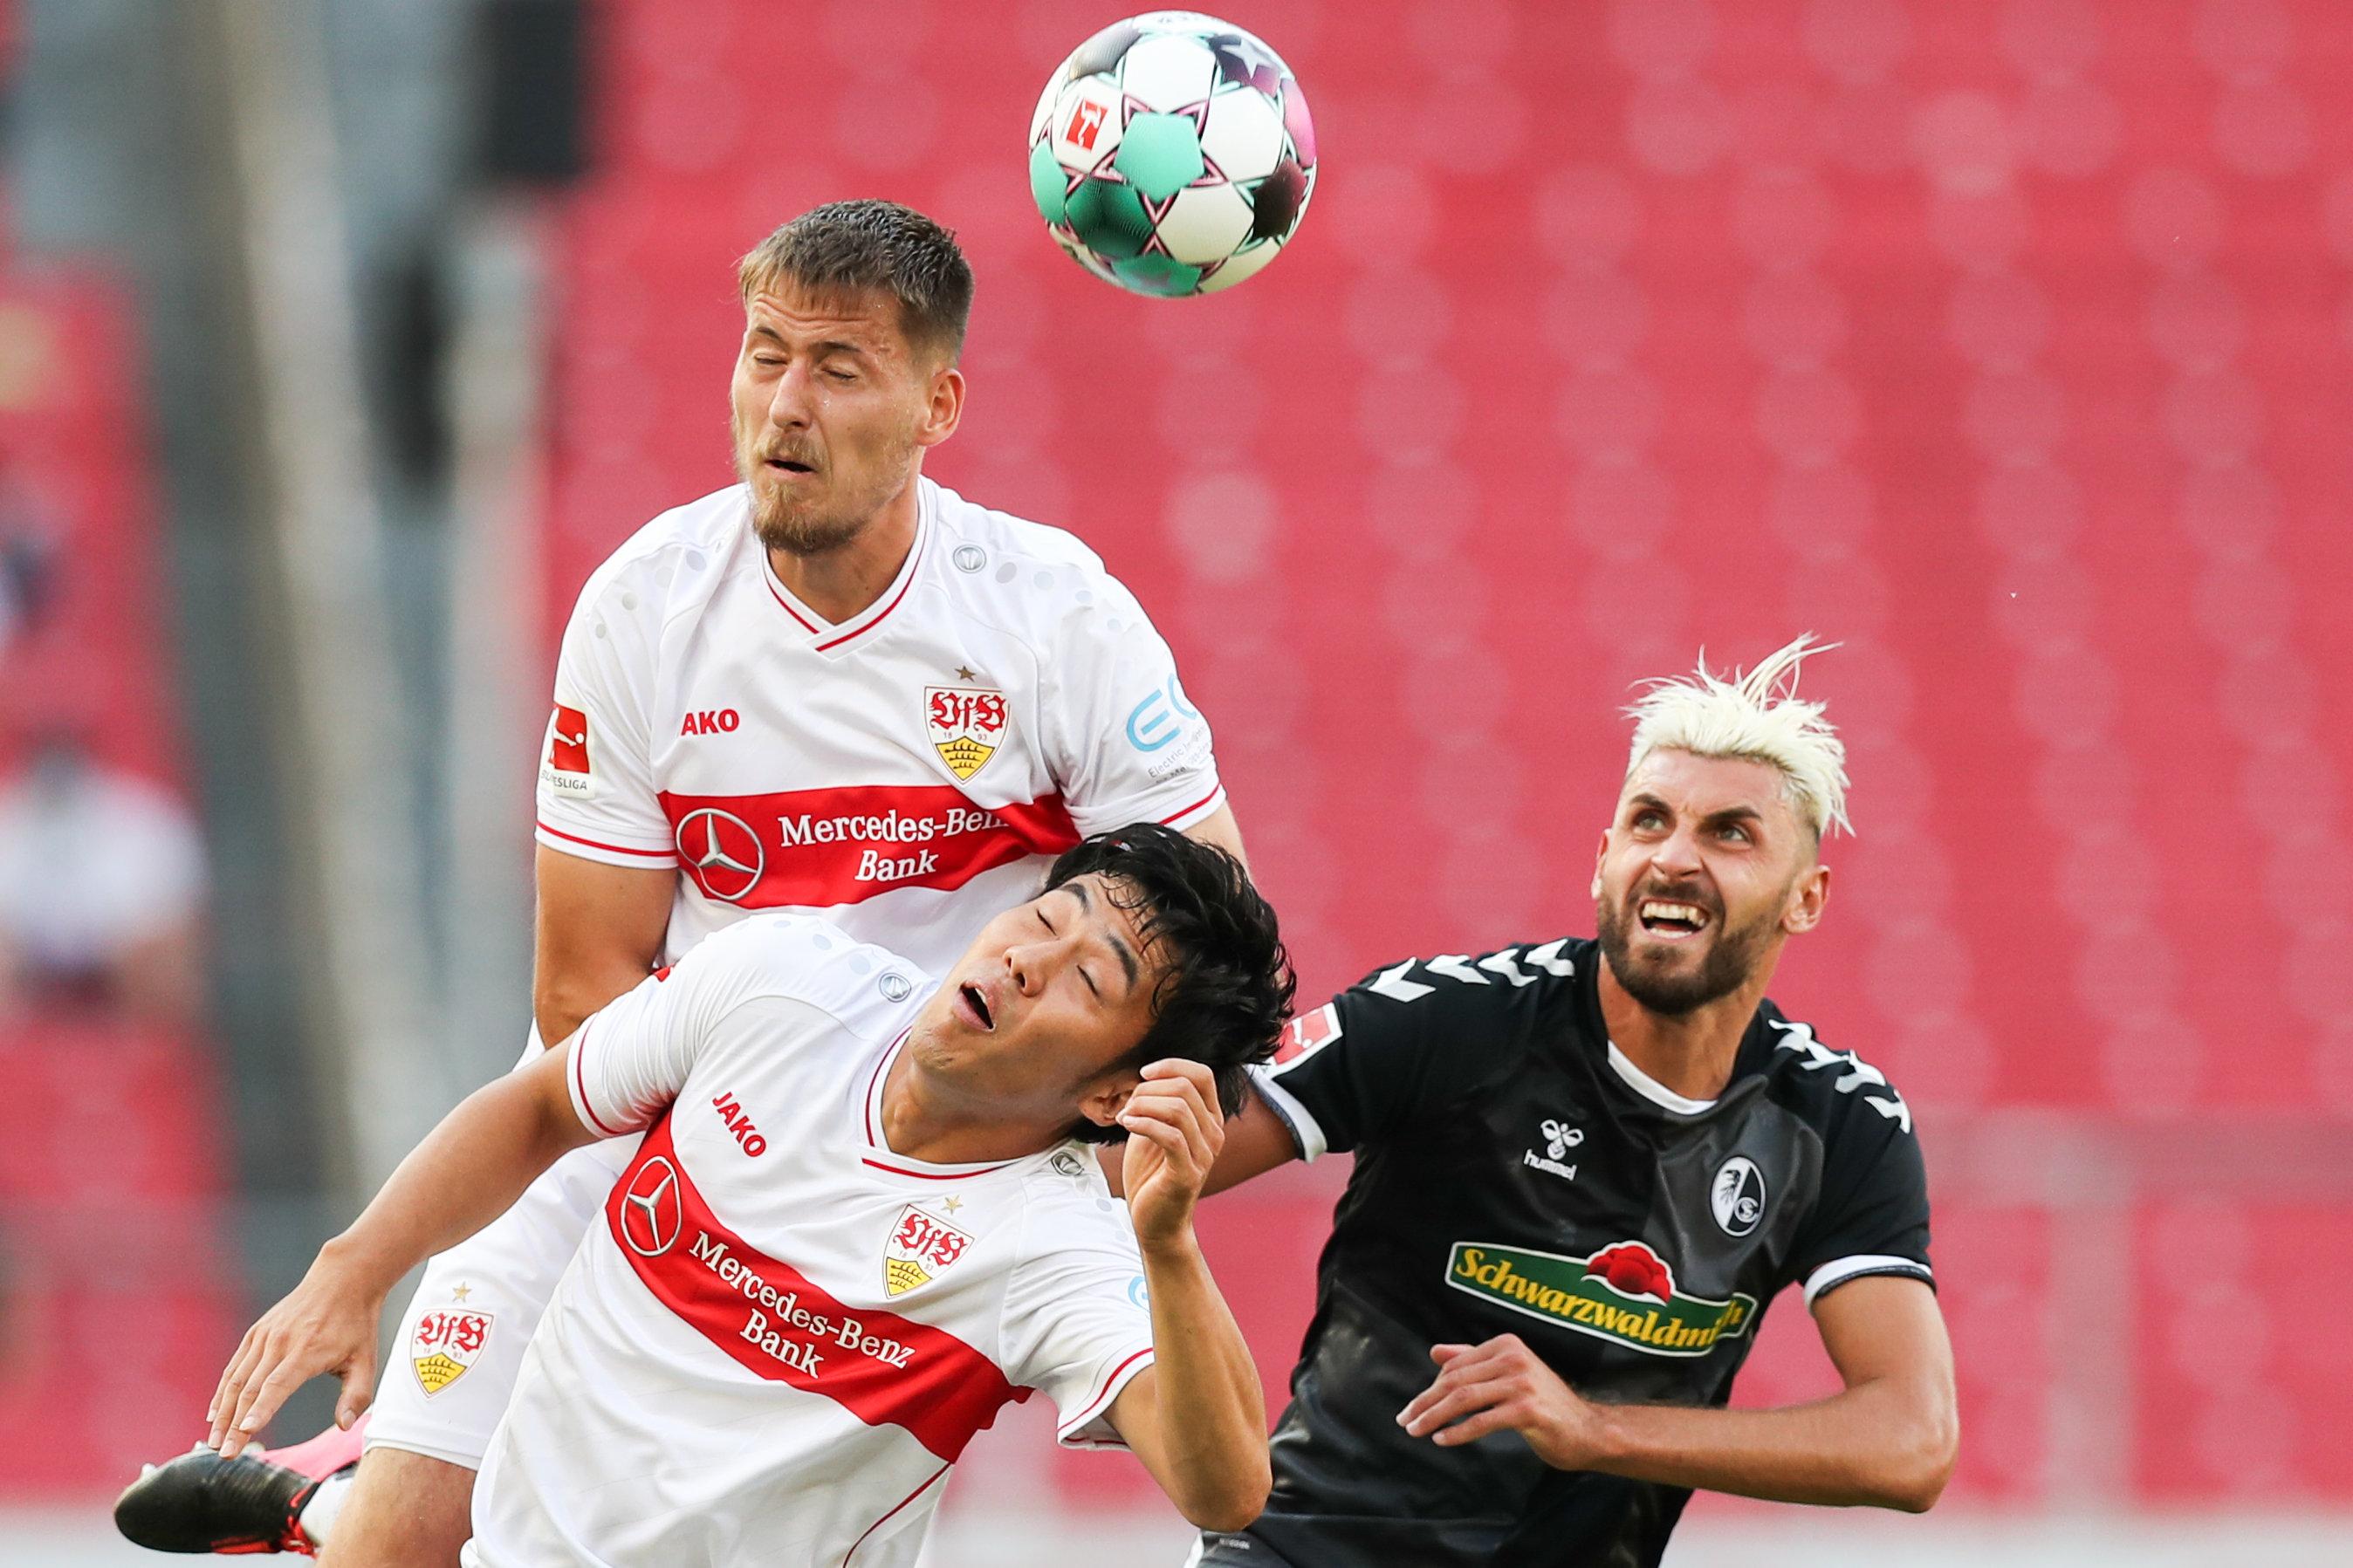 Der VfB Stuttgart zeigt gegen den SC Freiburg große Moral.